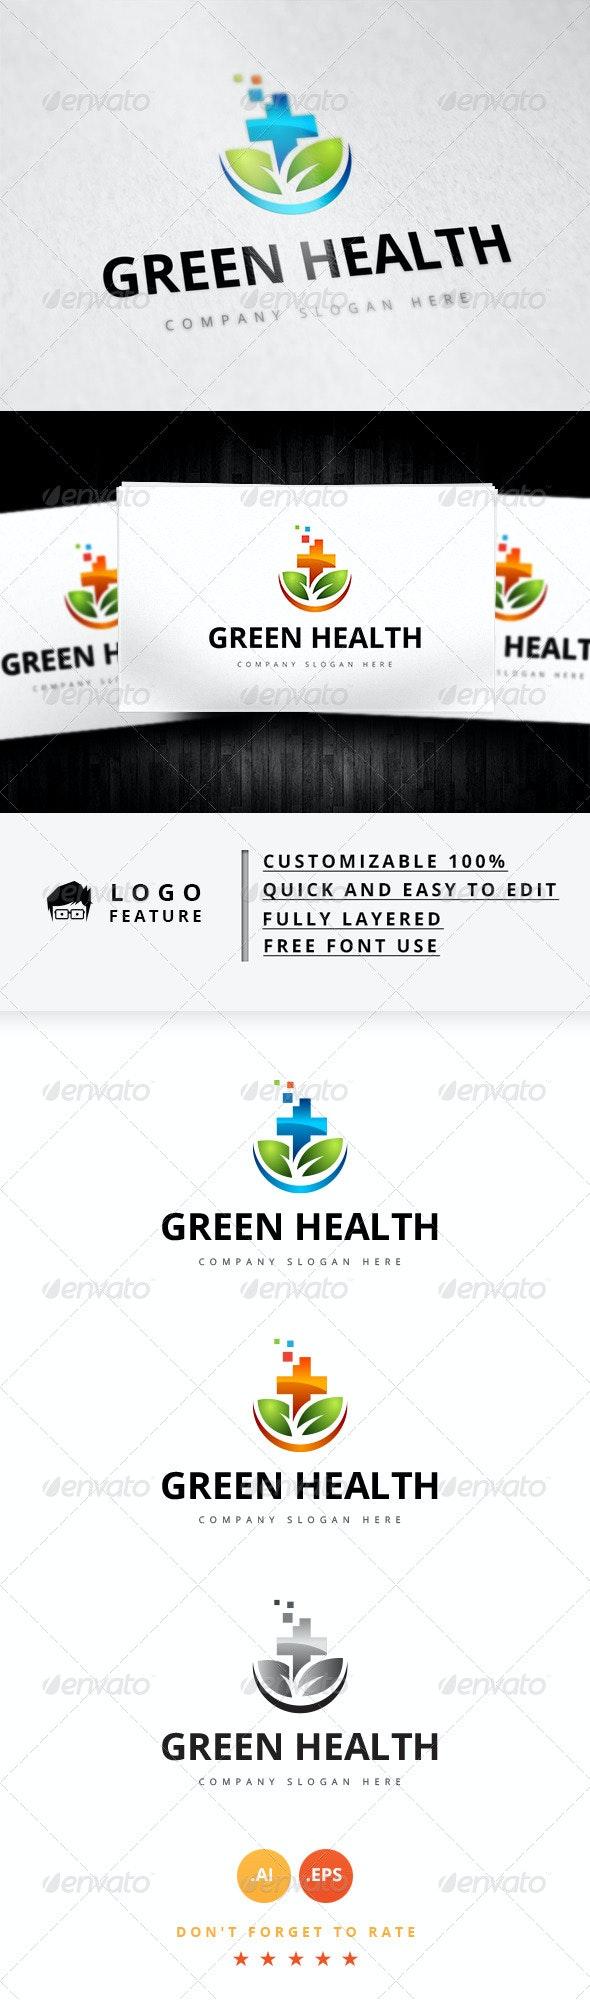 Green Health V.2 - Logo Templates